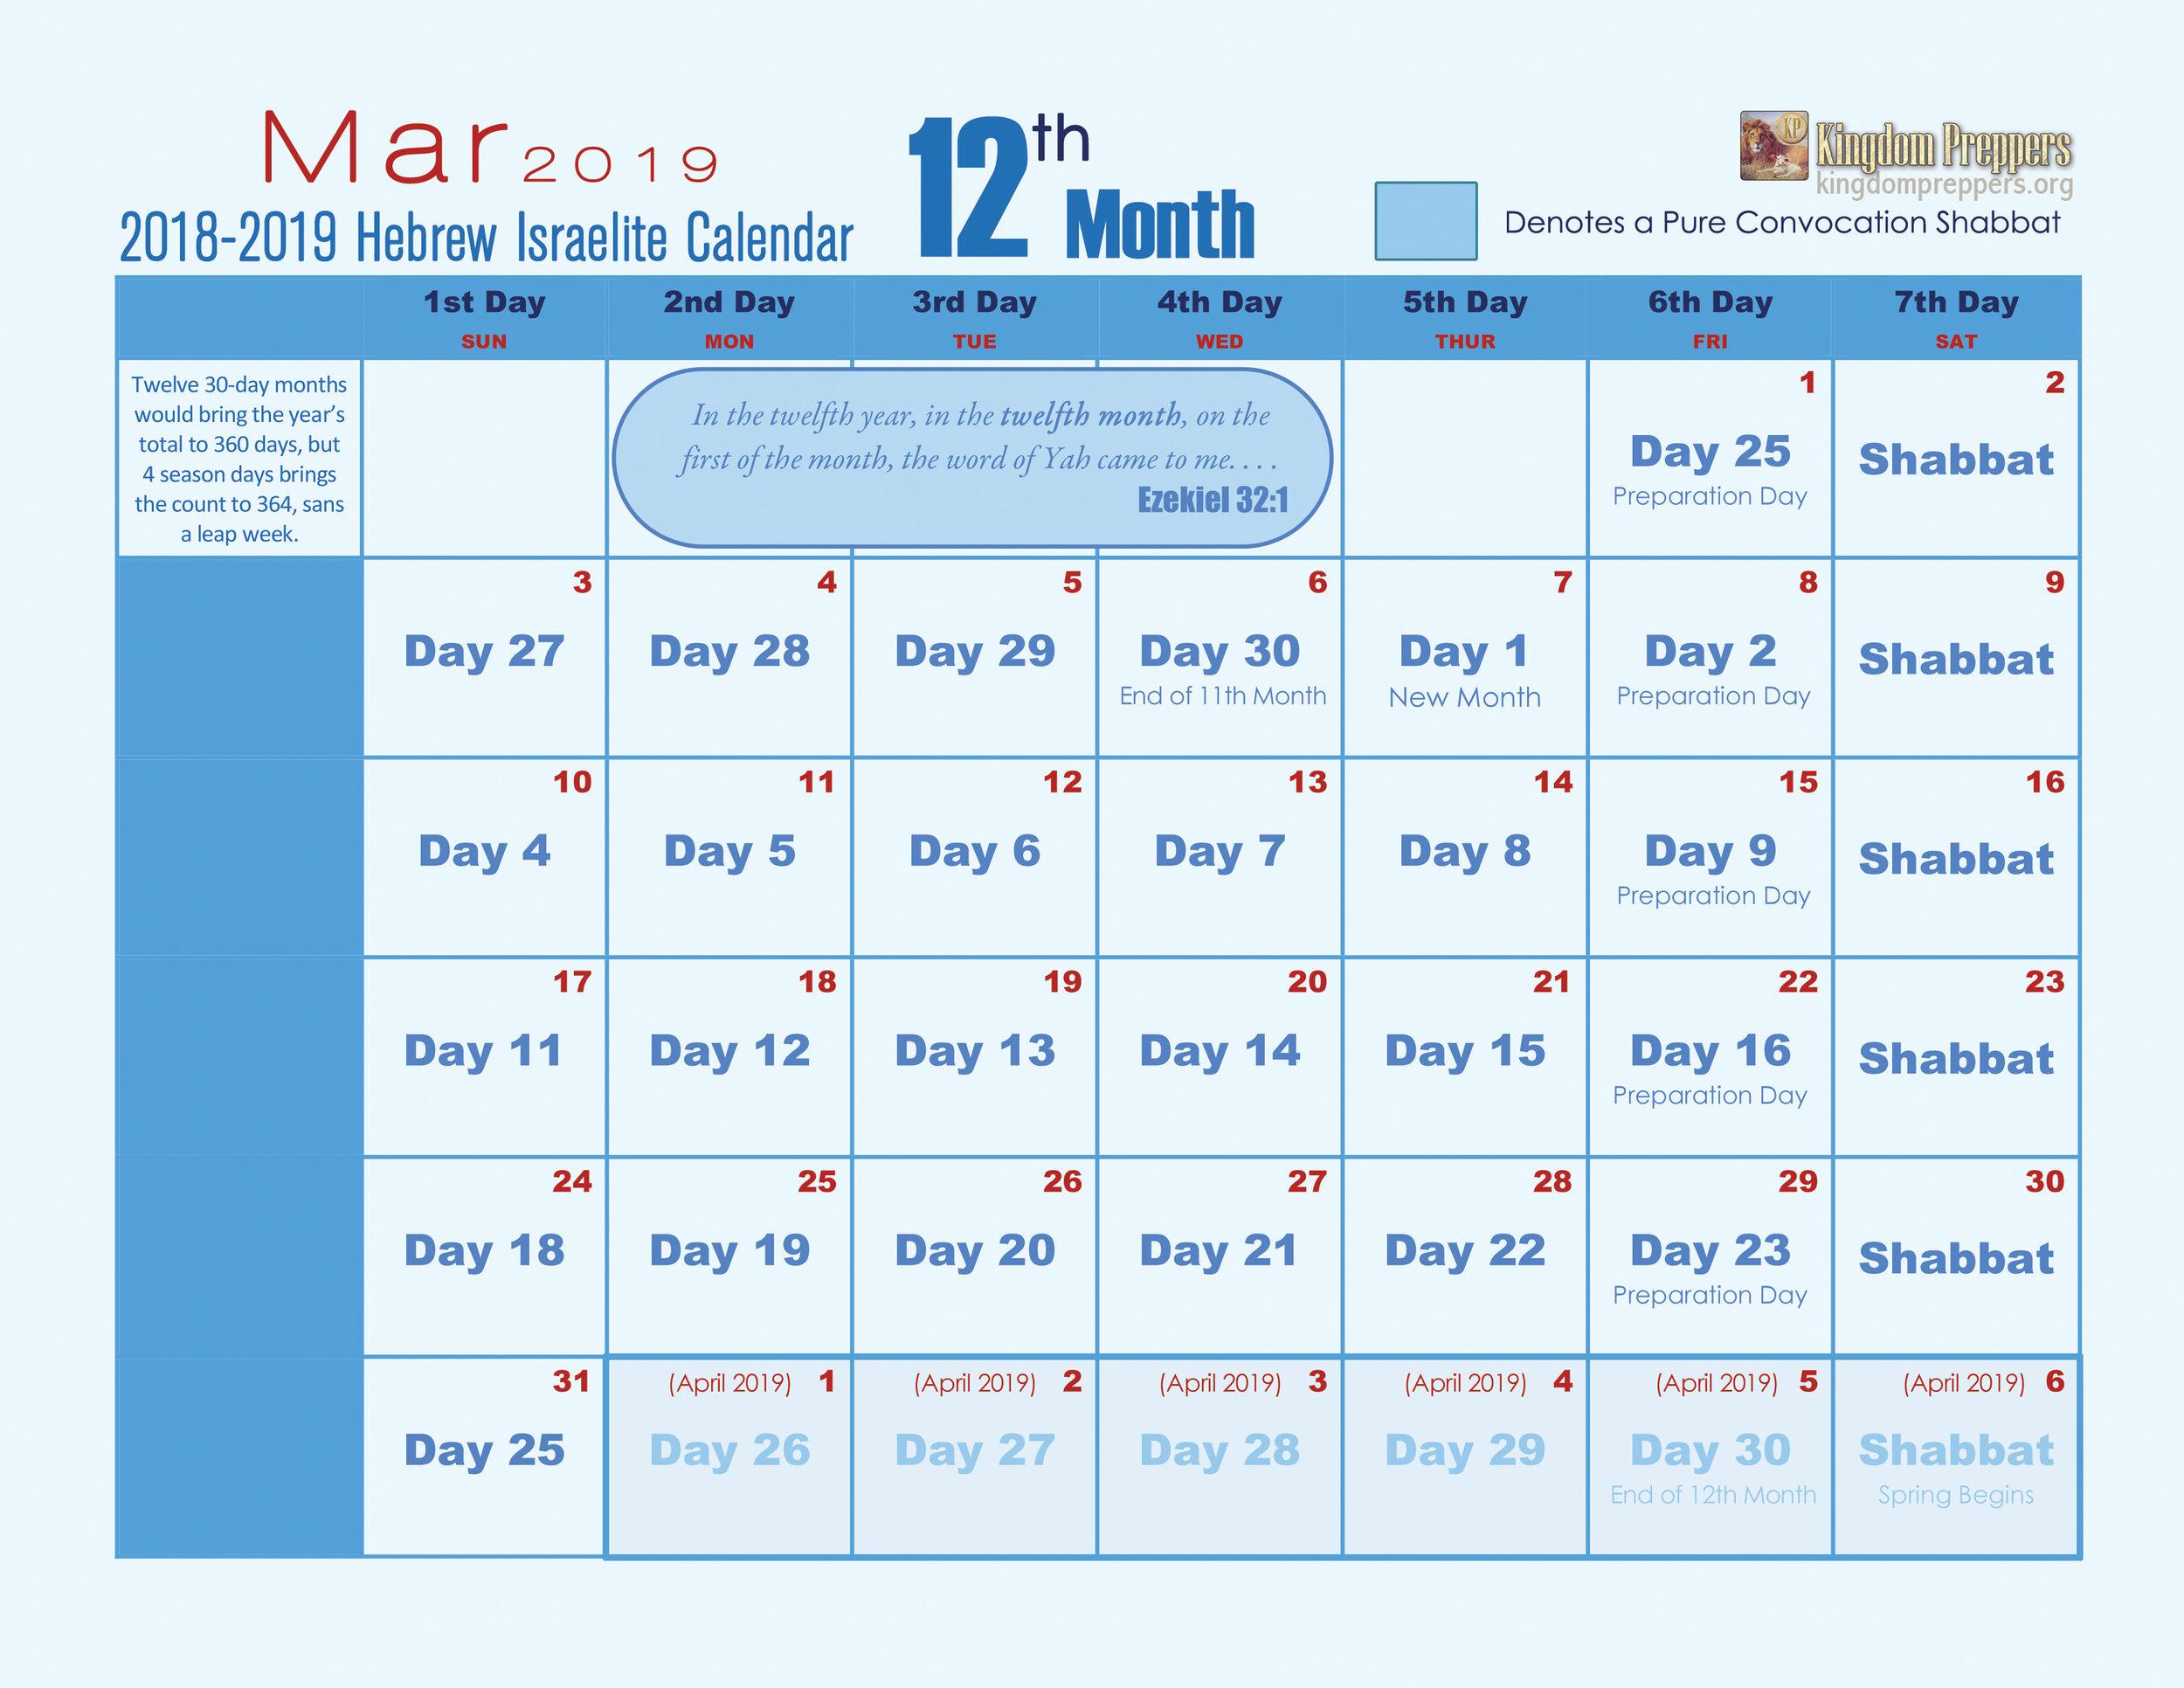 Hebrew Israelite Calendar (2018-2019) \u2014 Kingdom Preppers